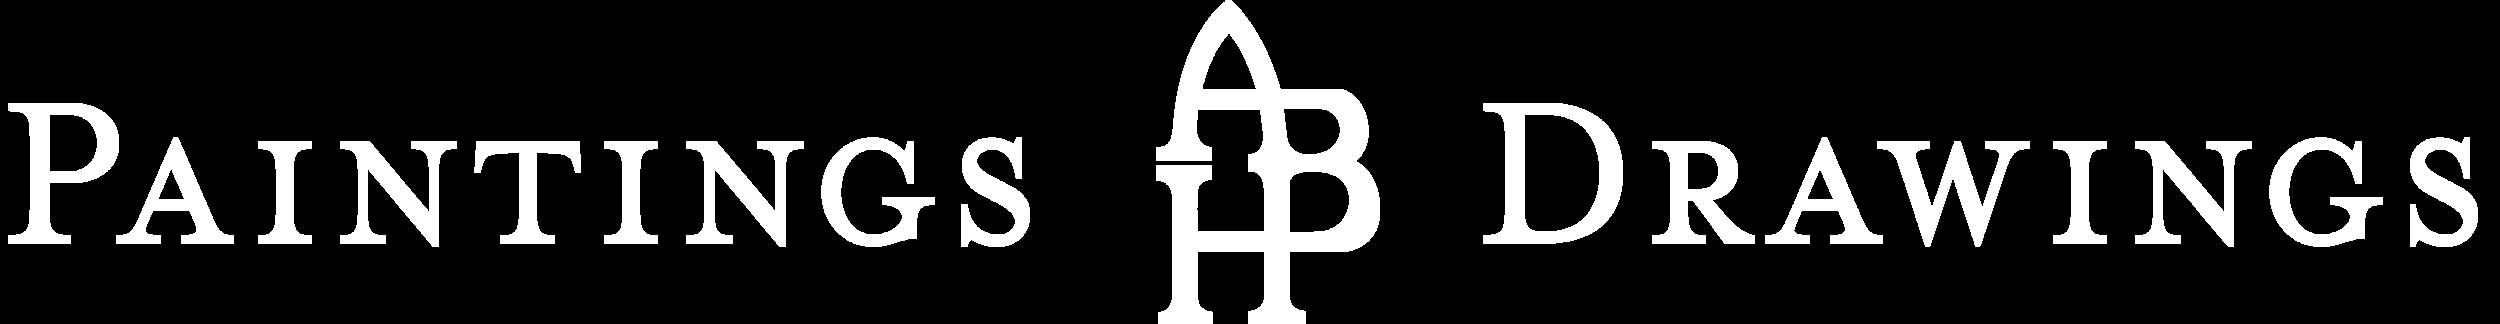 ABH_Logo_PaintingsDrawings_MrsEavesSmallCaps_white.png